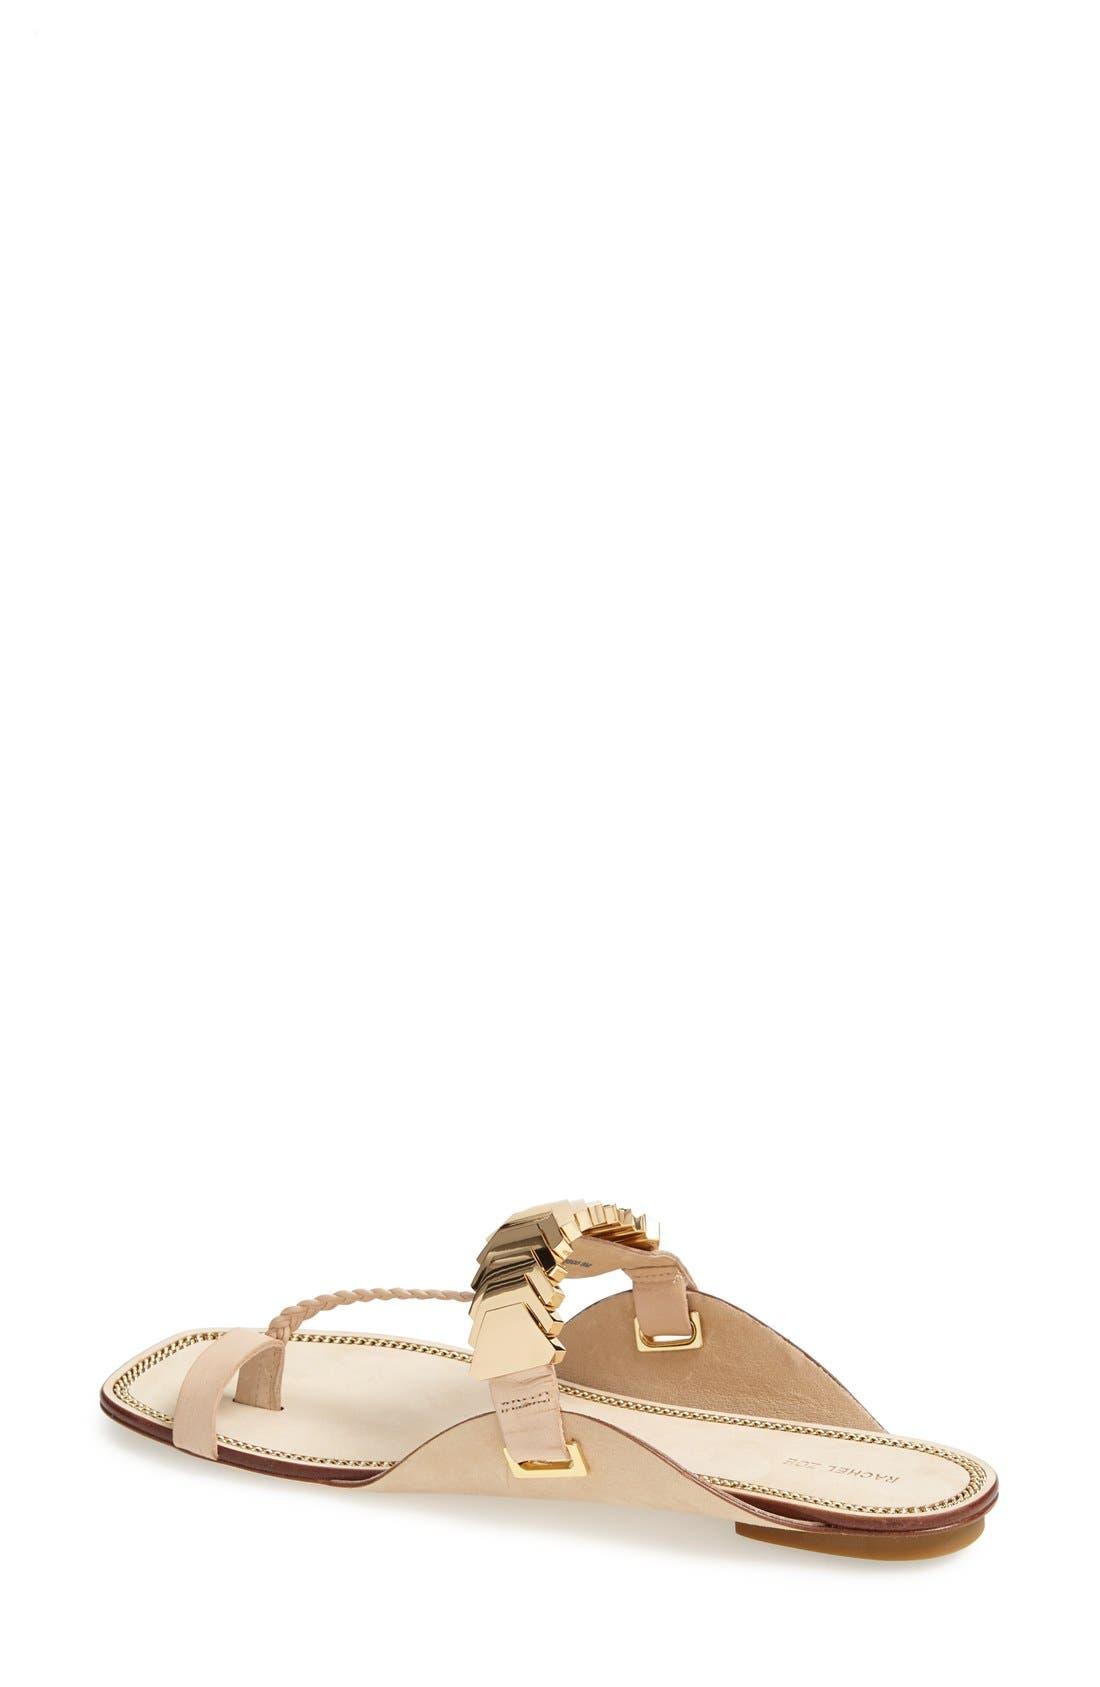 Alternate Image 2  - Rachel Zoe 'Ida' Leather Toe Loop Sandal (Women)